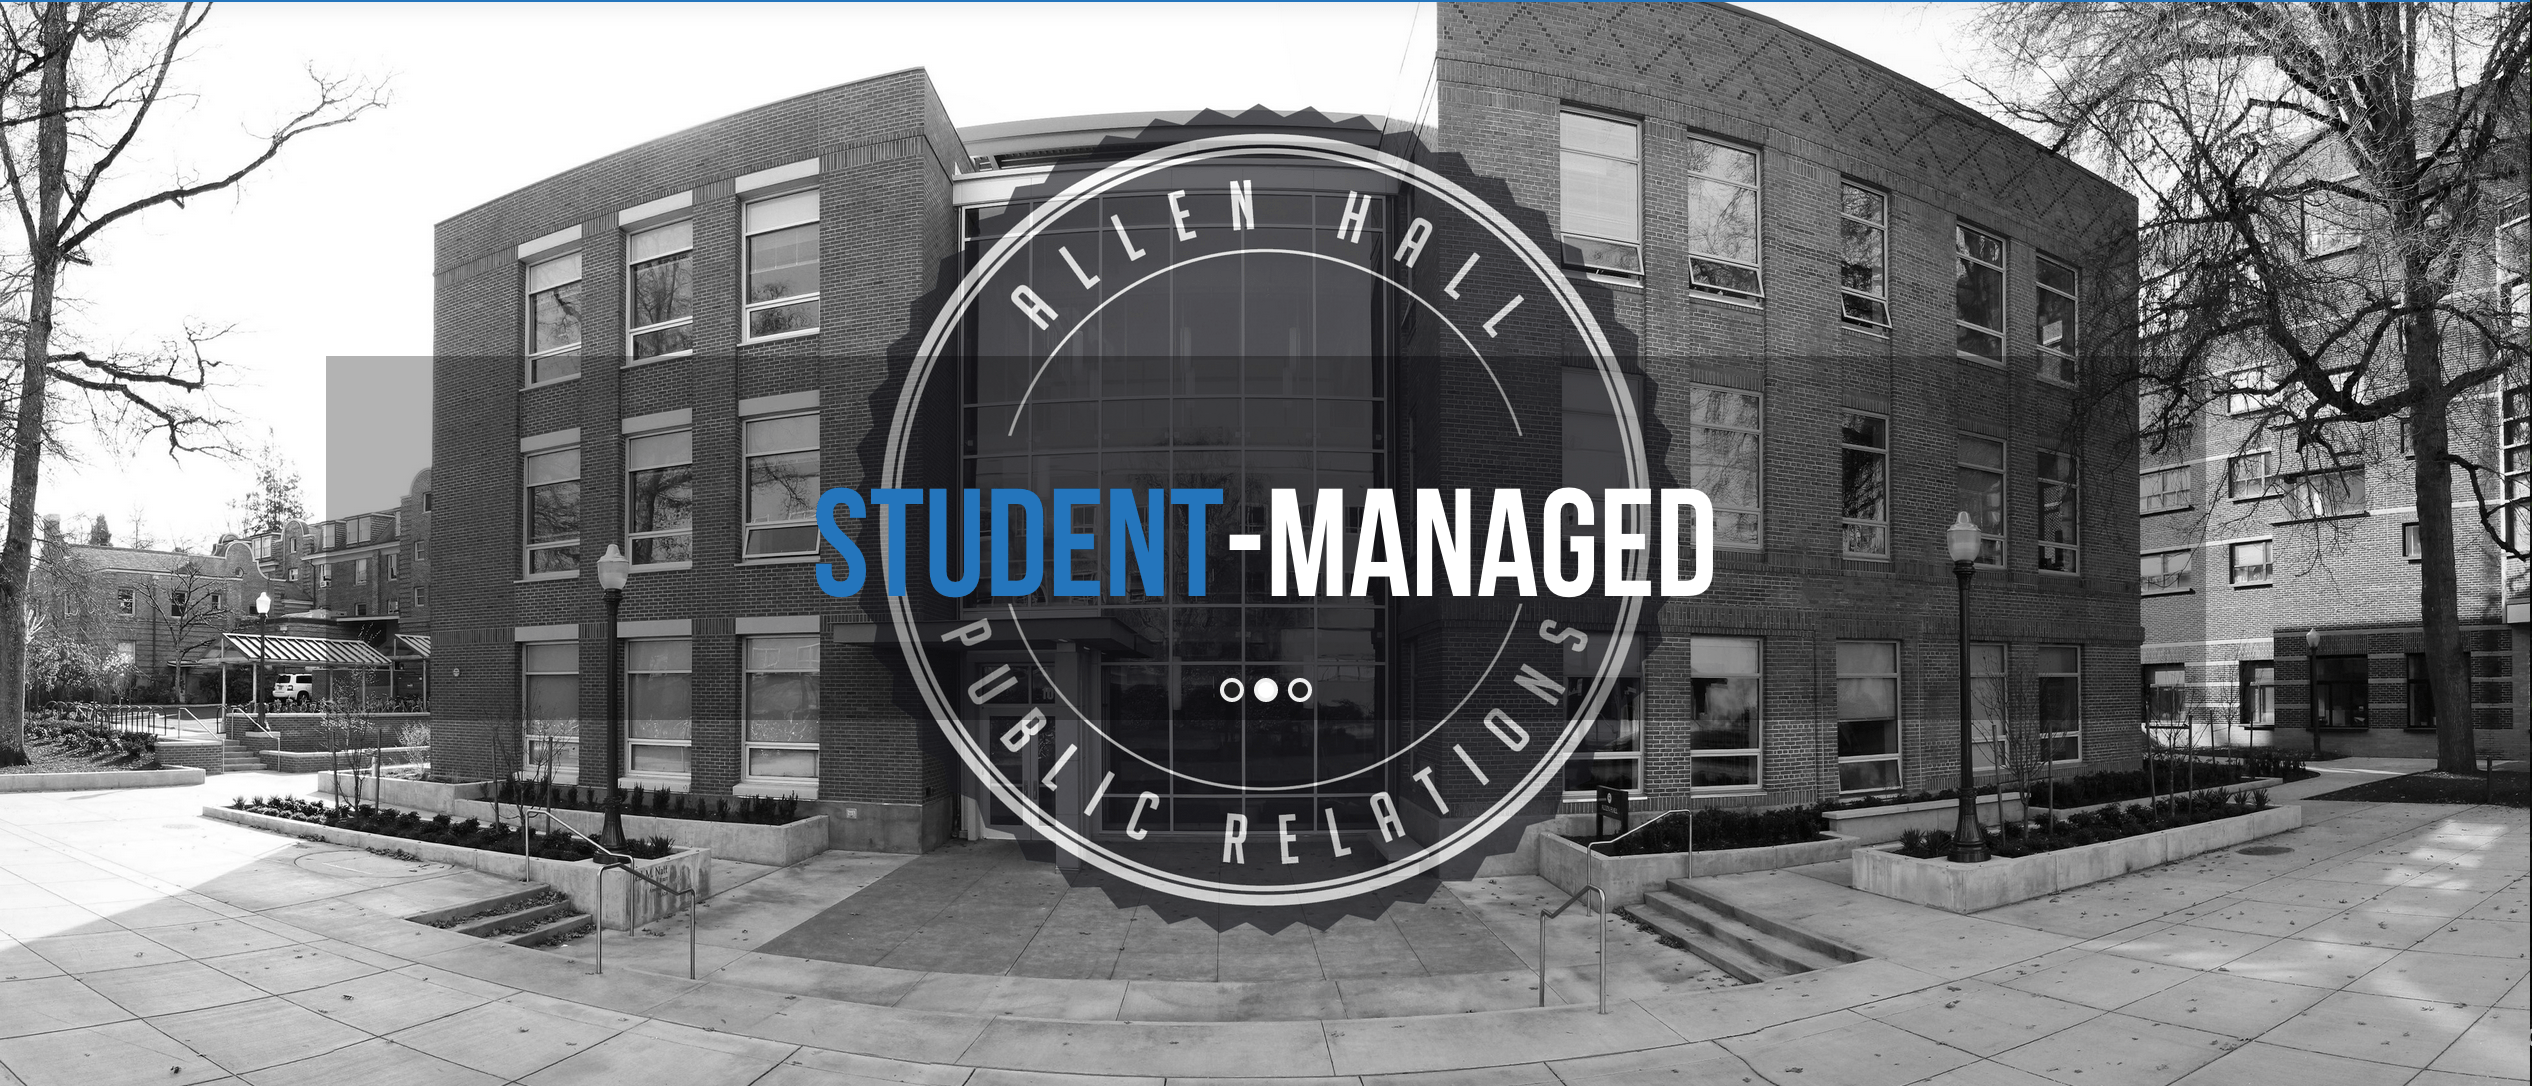 Meet the Management Team: Q&A With Firm Director Jessica Glackin